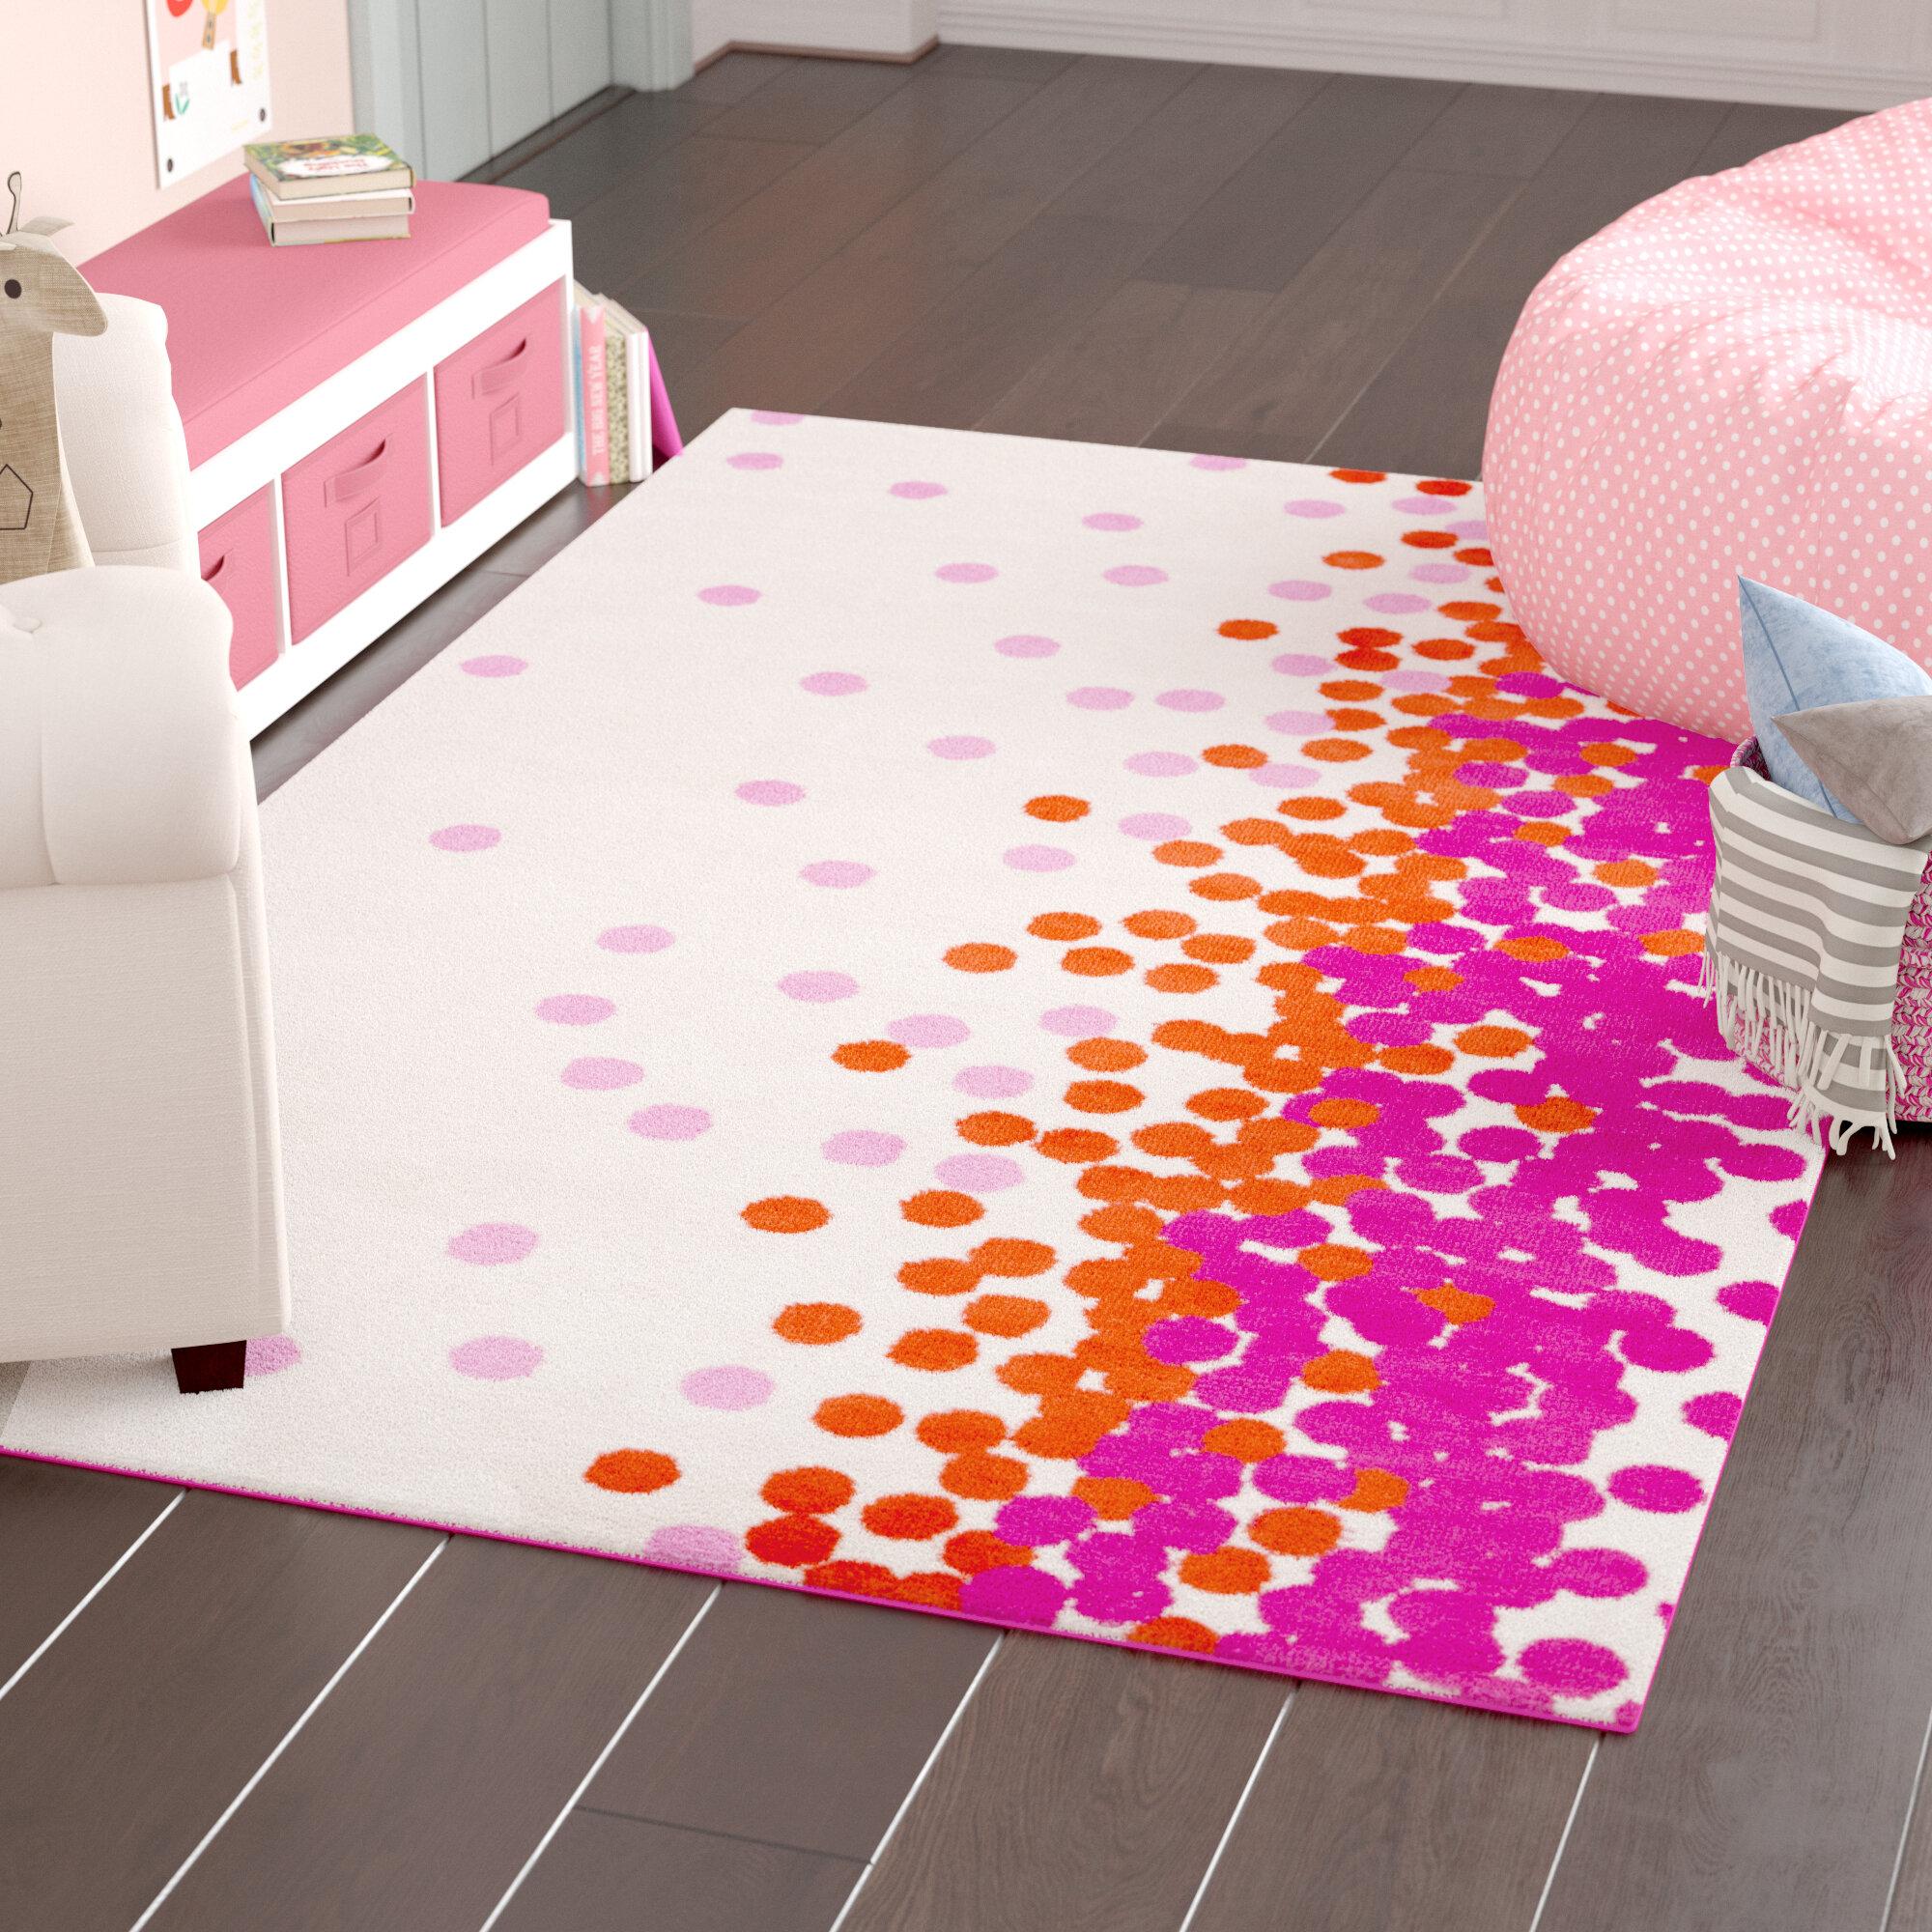 Harriet Bee Clive Hot Pink Carnation Area Rug Reviews Wayfair